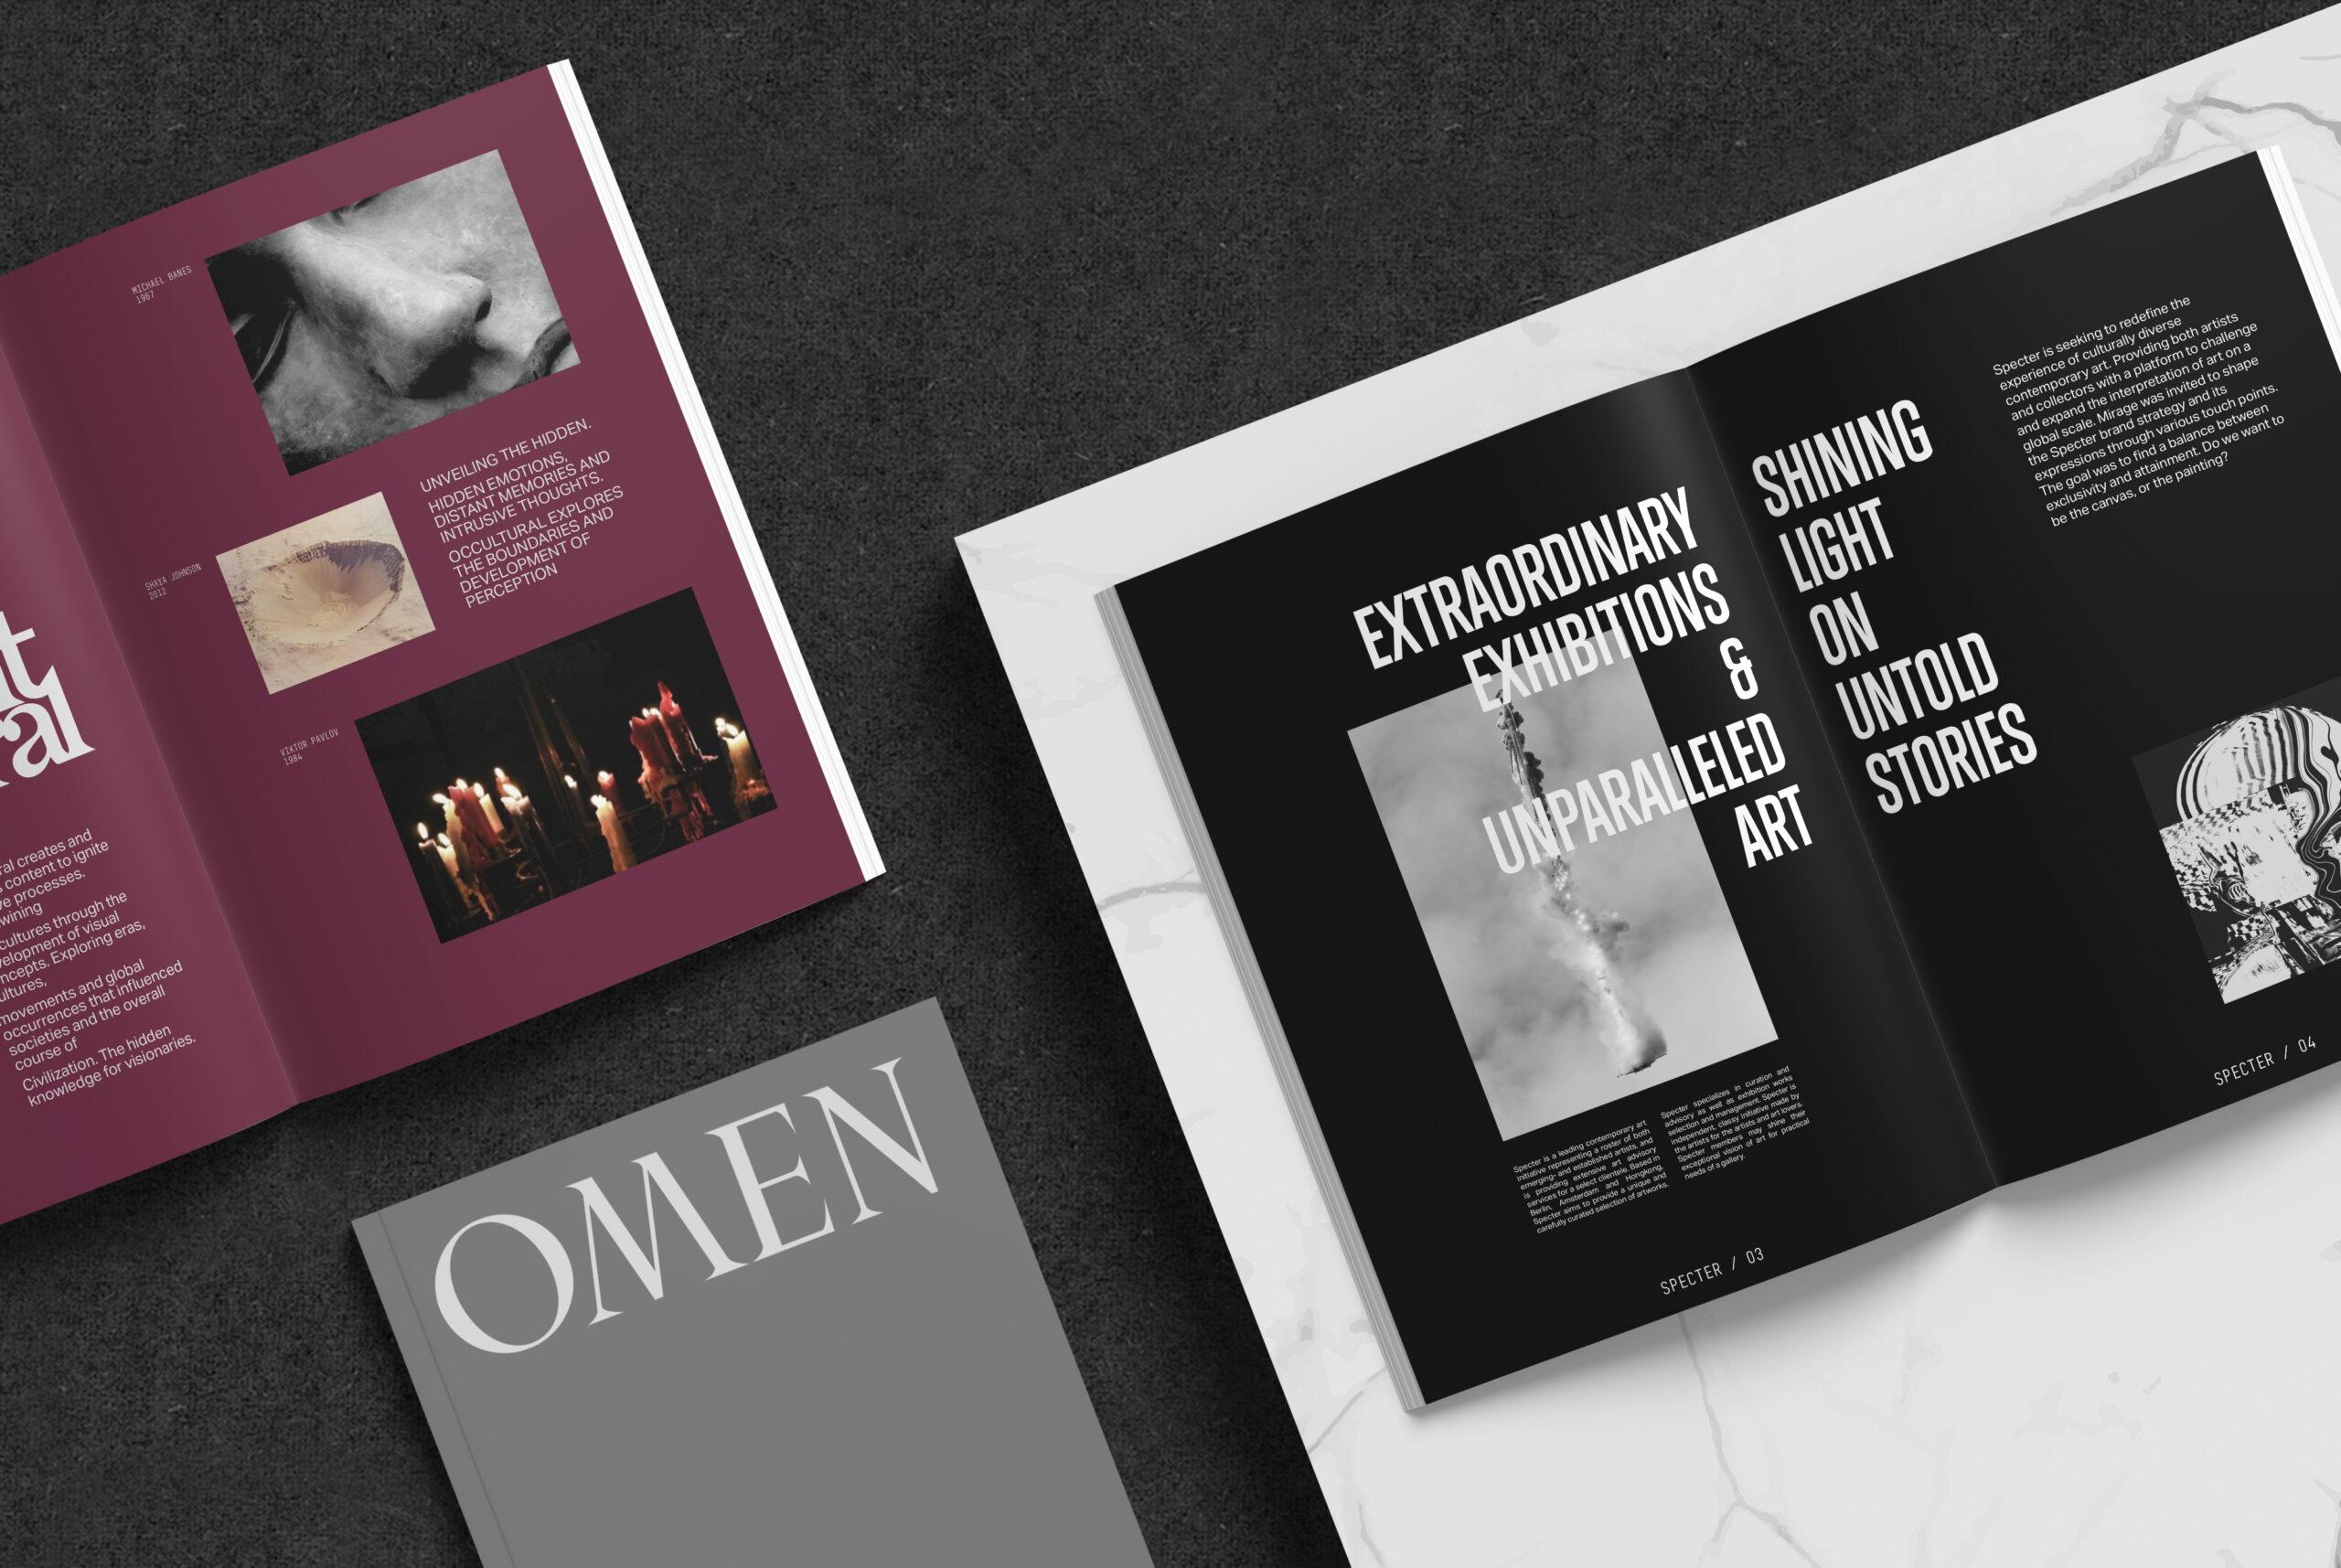 Omen Enterprises Books Mirage